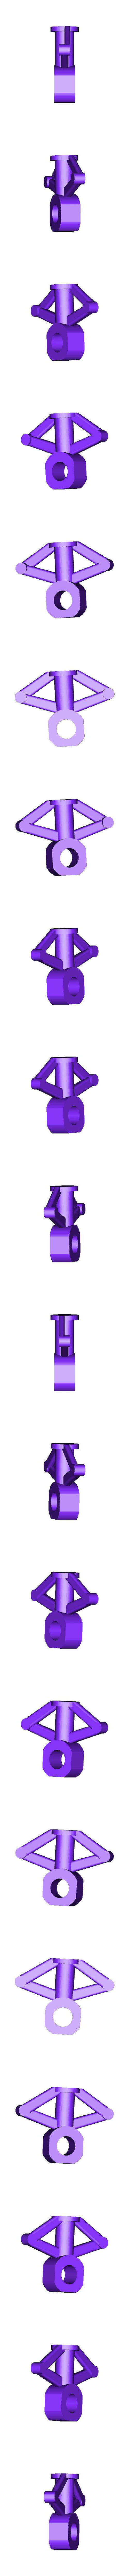 16 LOWER LH LDG.stl Download STL file DOUGLAS F4D SKYRAY  • 3D printer object, 3DprintedArmy